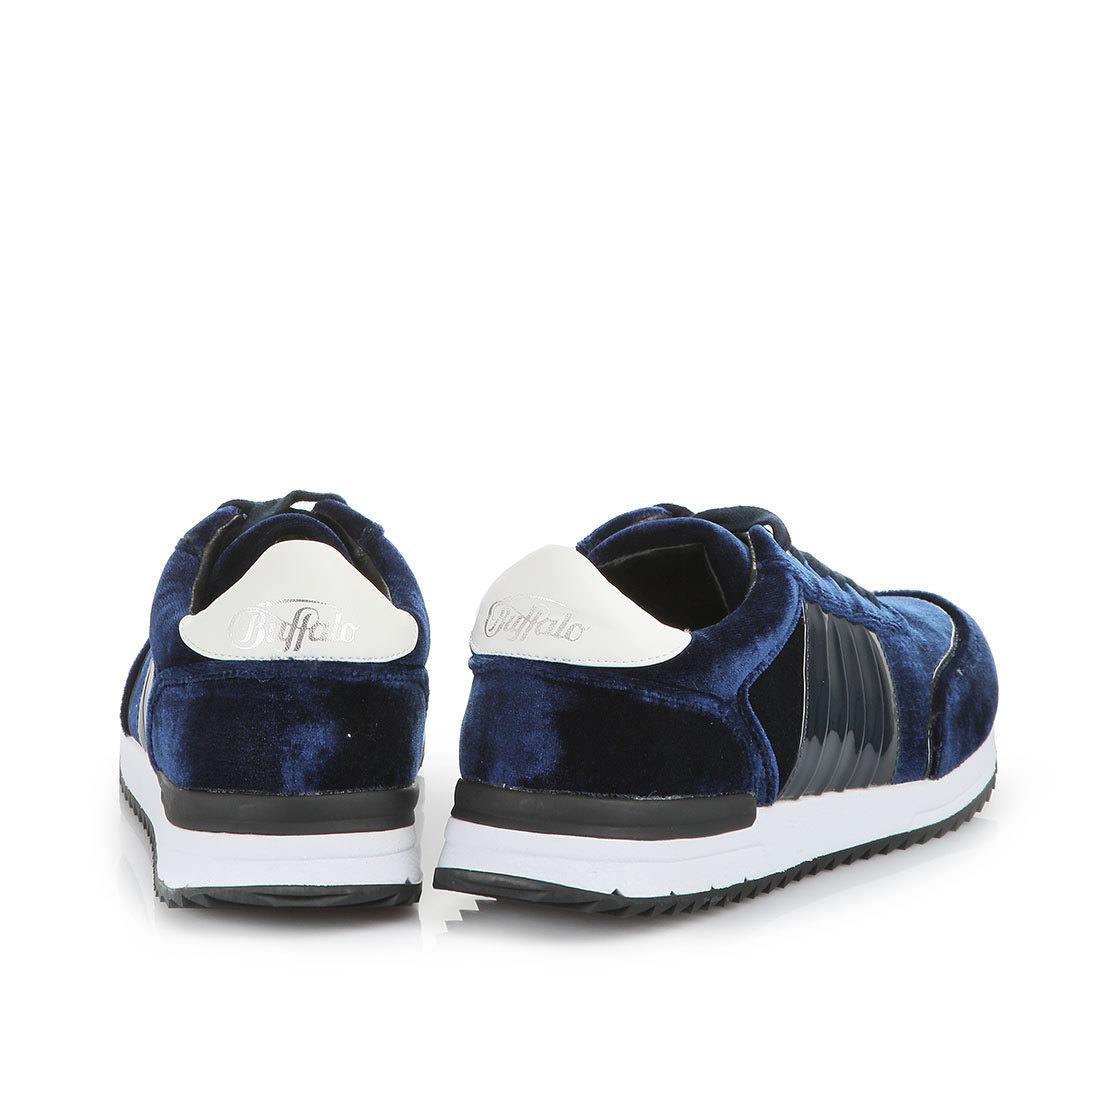 KaufenBuffalo® Buffalo Samt Sneaker In Aus Online Dunkelblau QoWdErCxBe